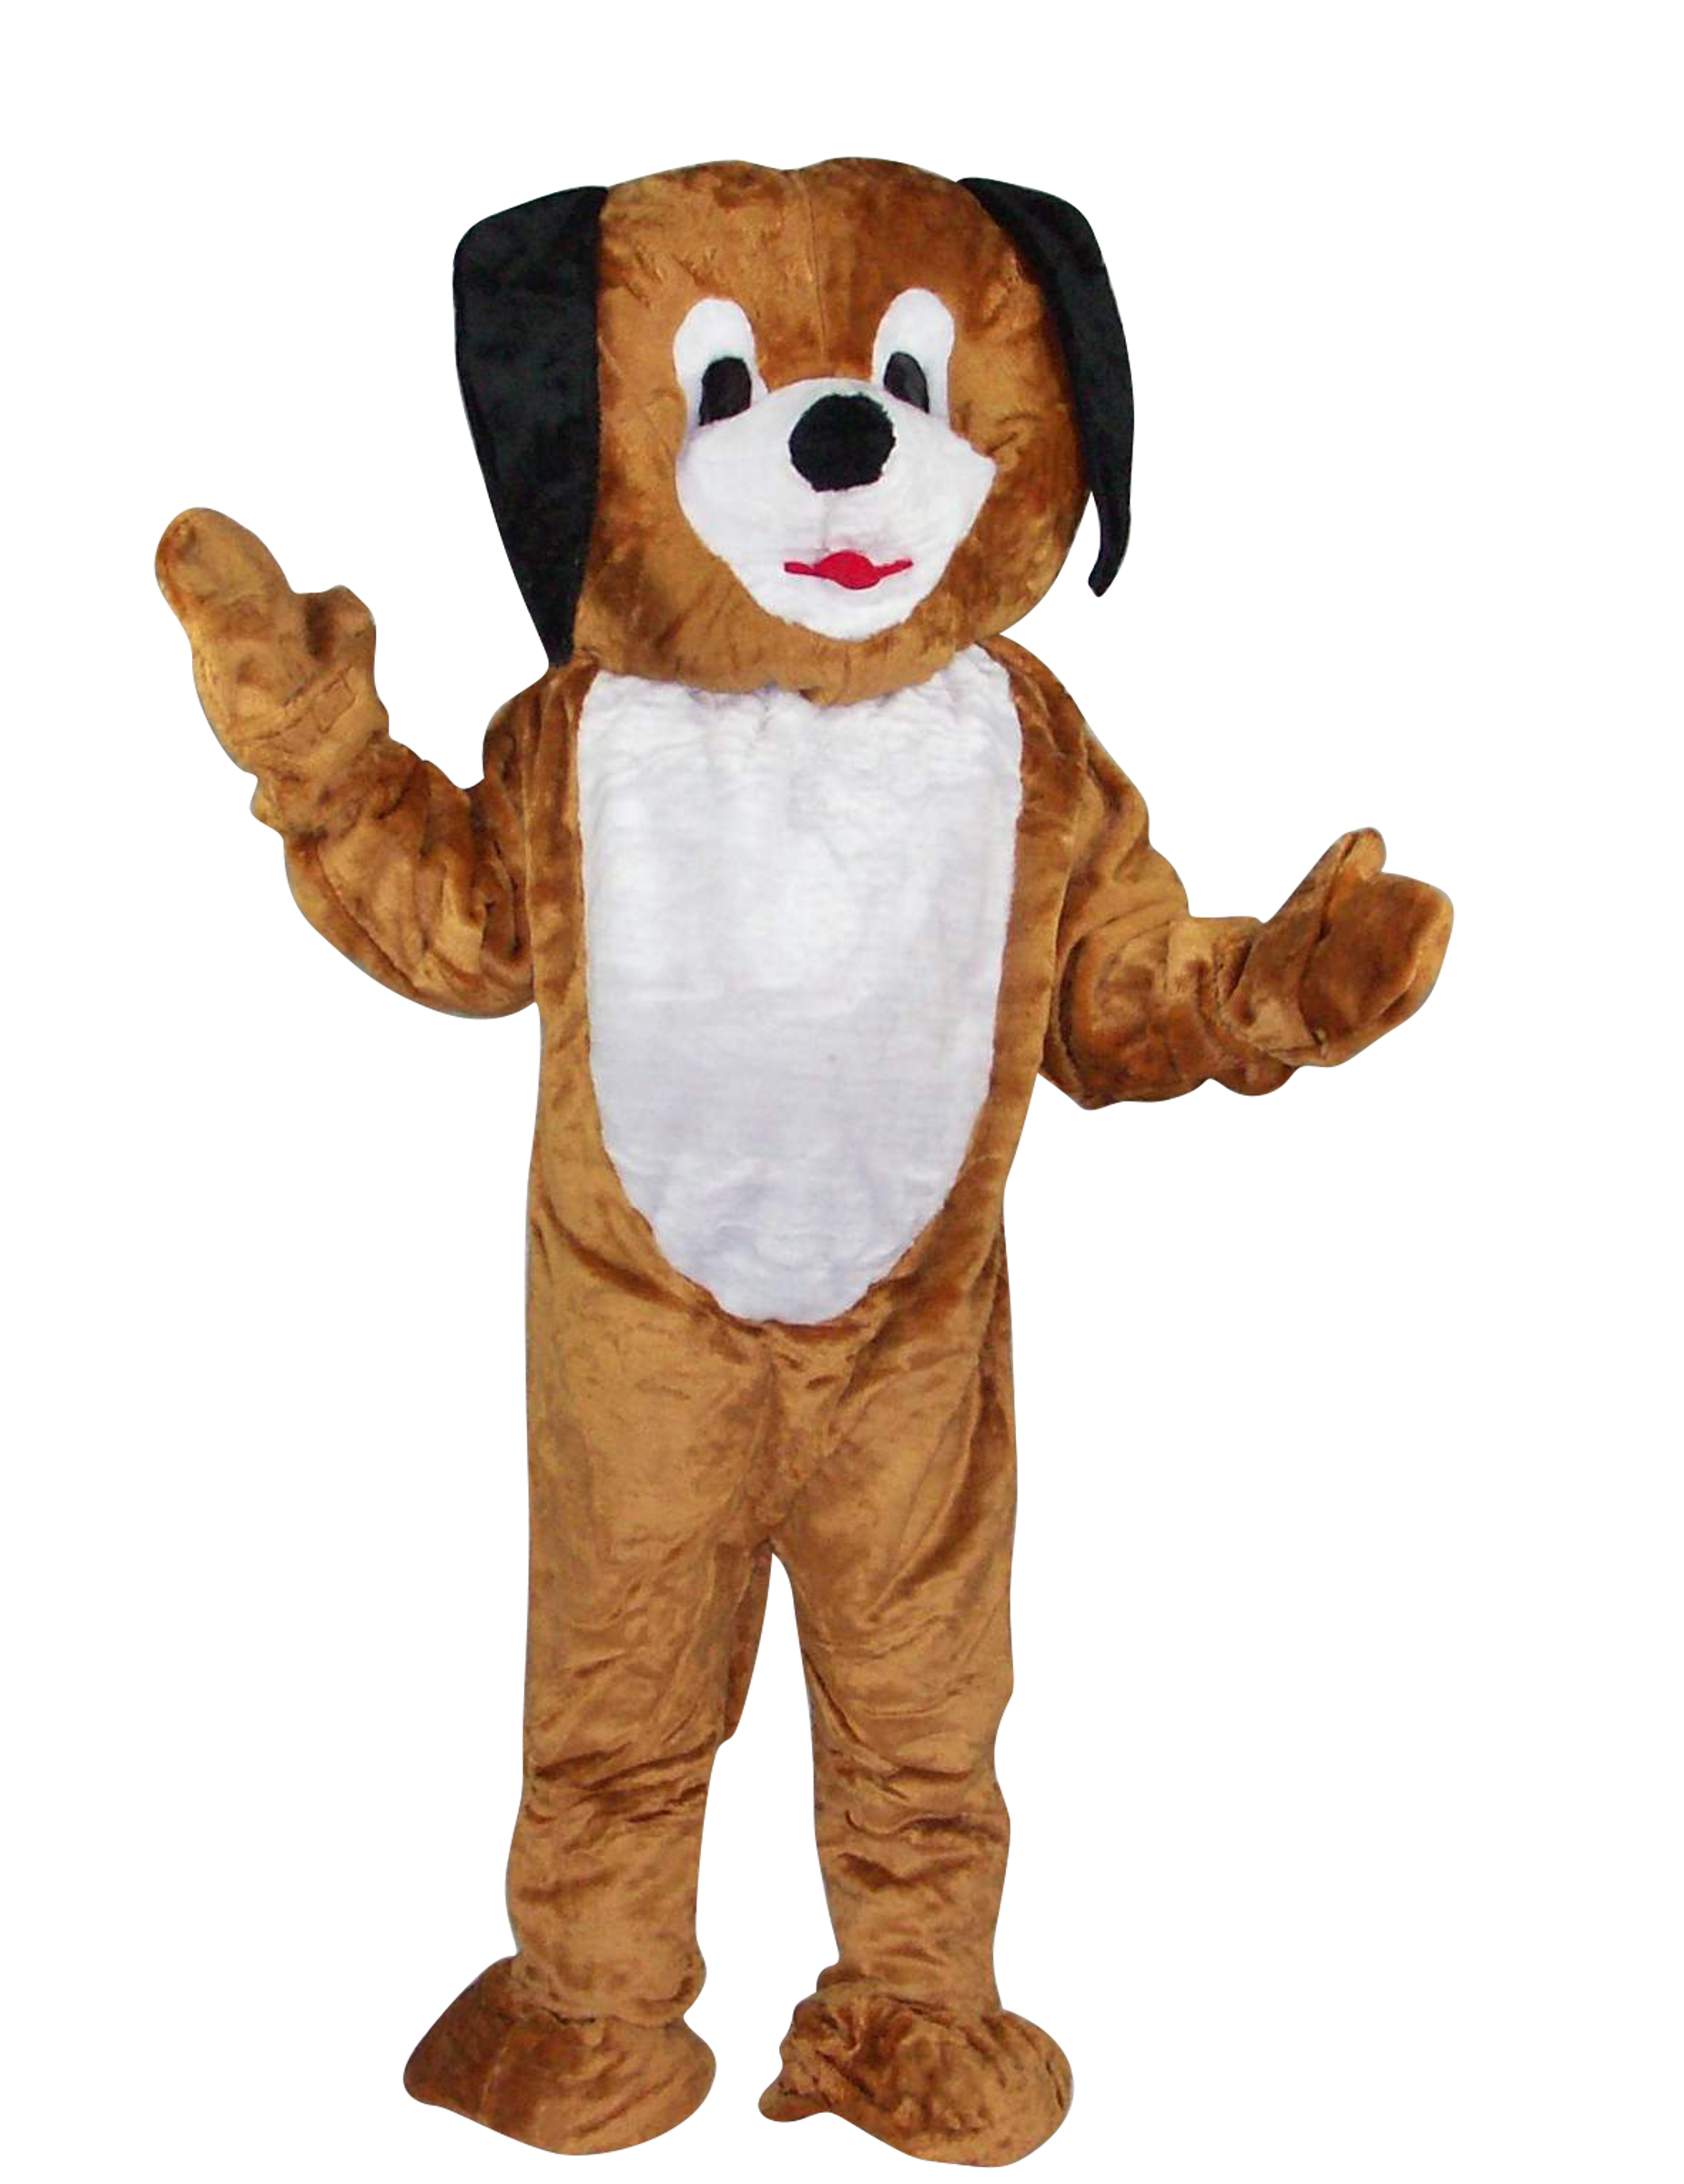 Mascotte chien maxi tête luxe adulte : Deguise-toi, achat